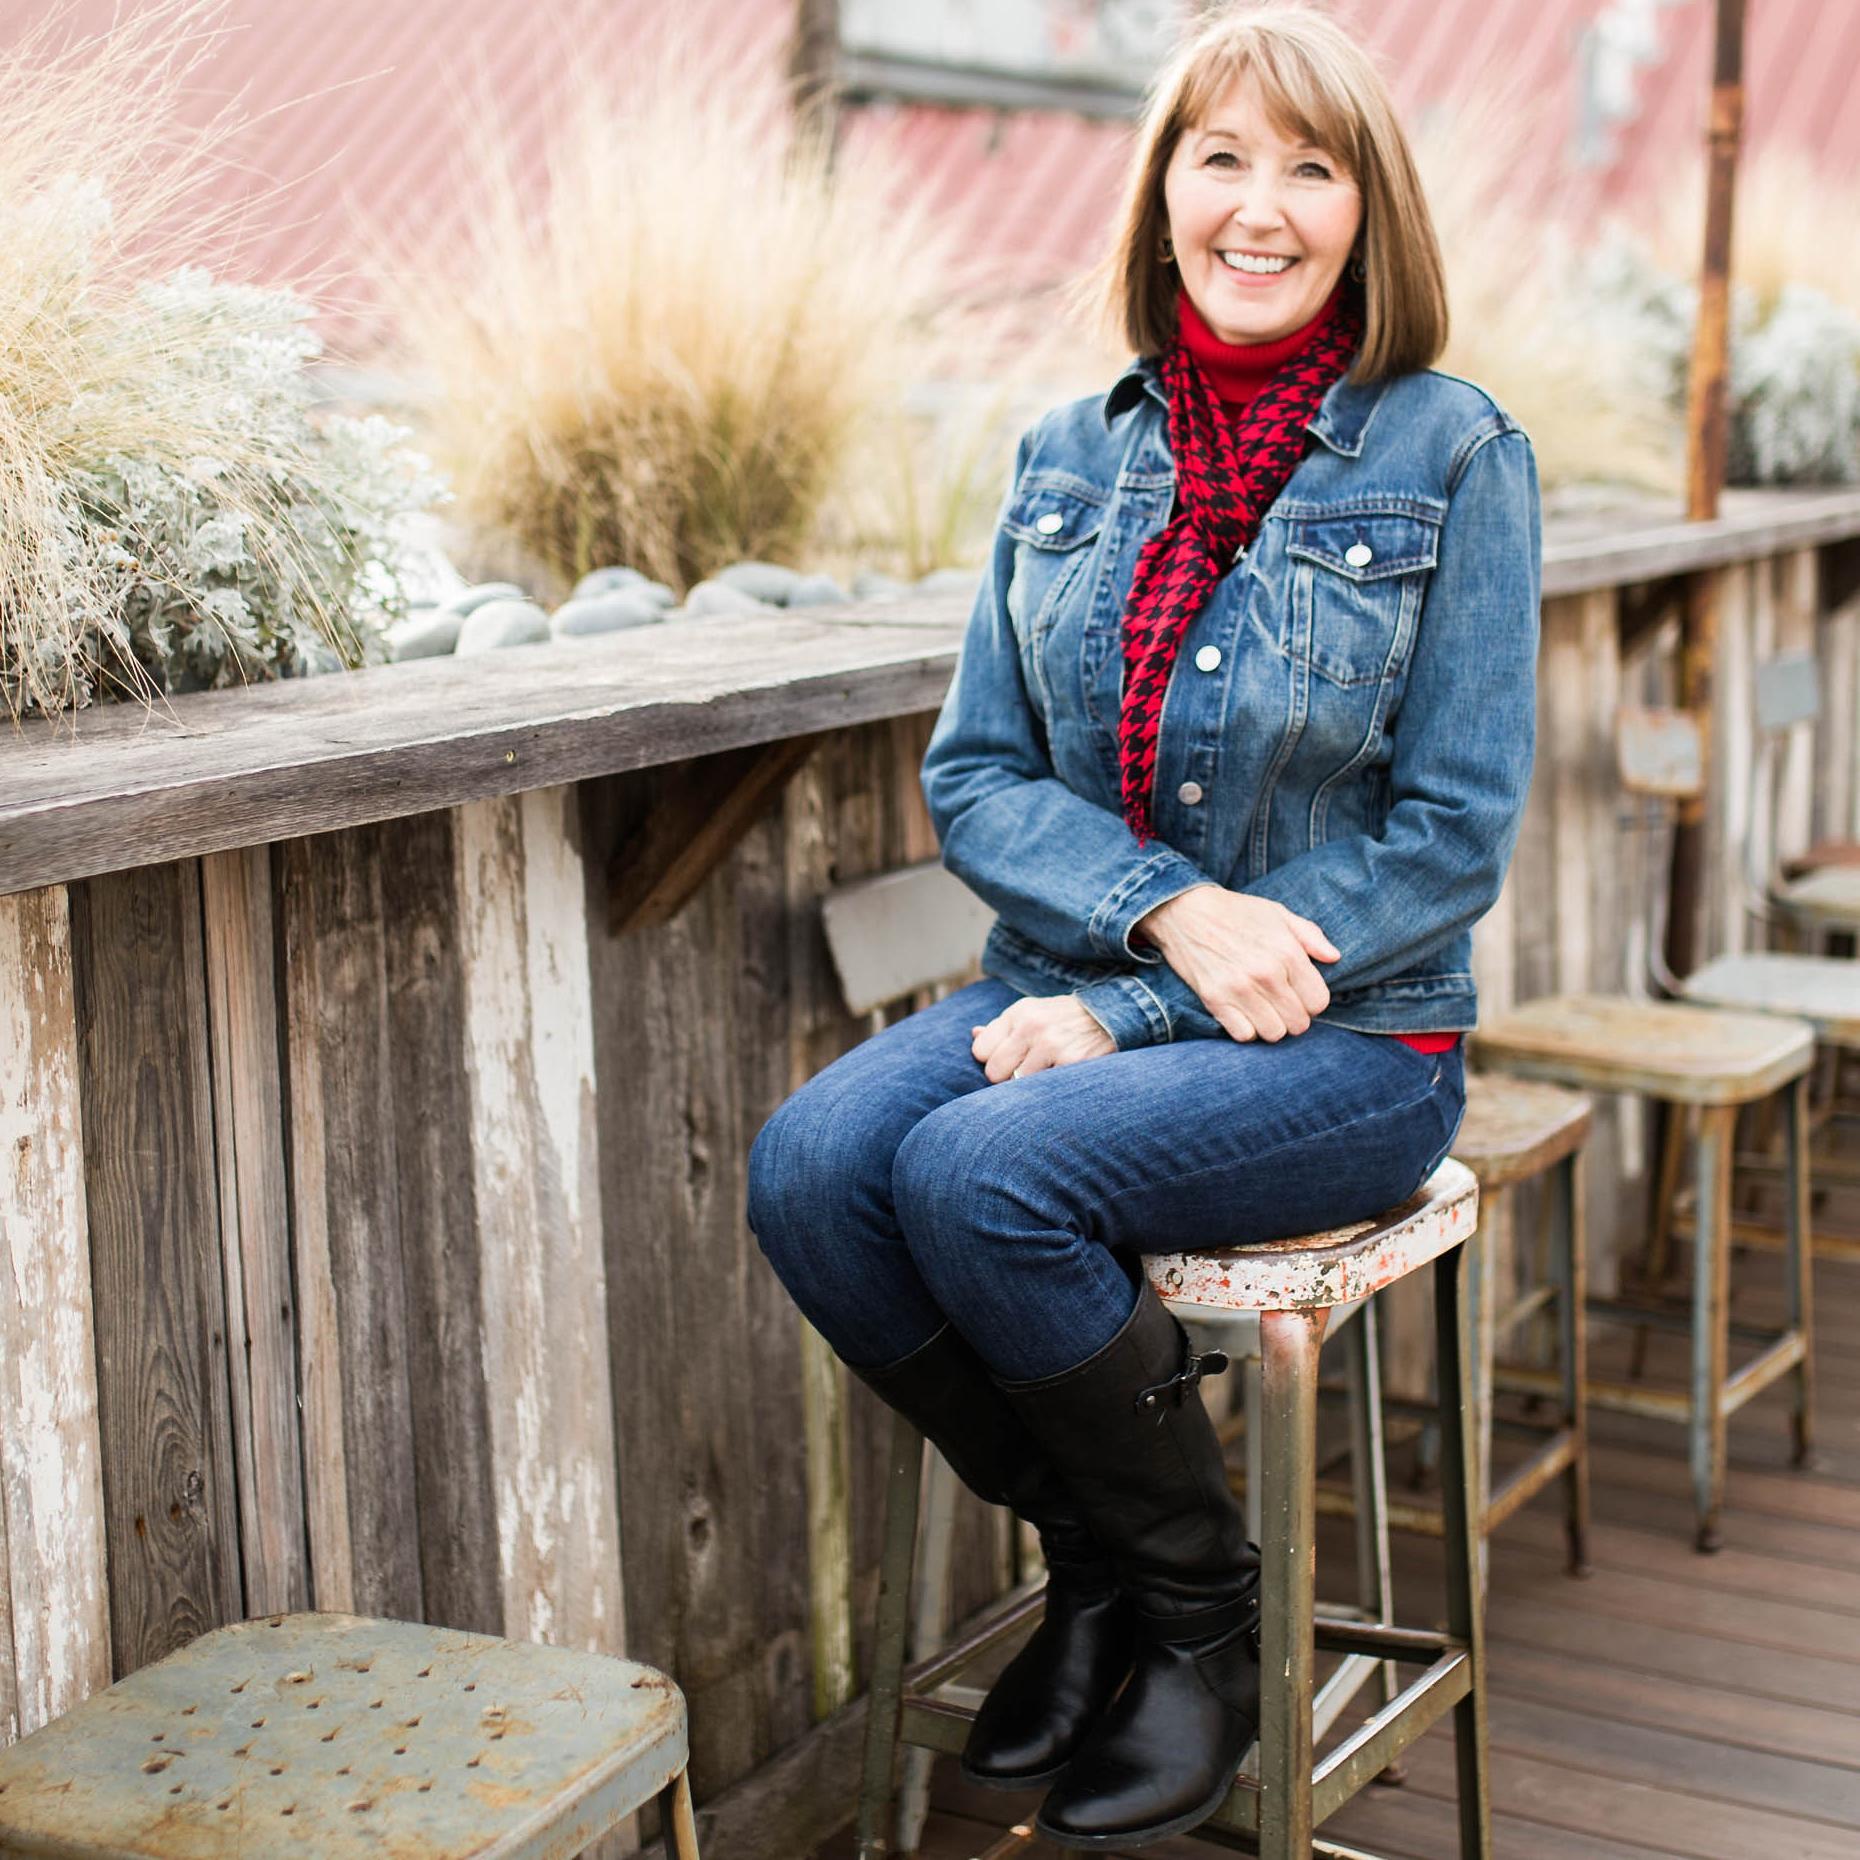 NOhep Supporter Spotlight: Karen Hoyt